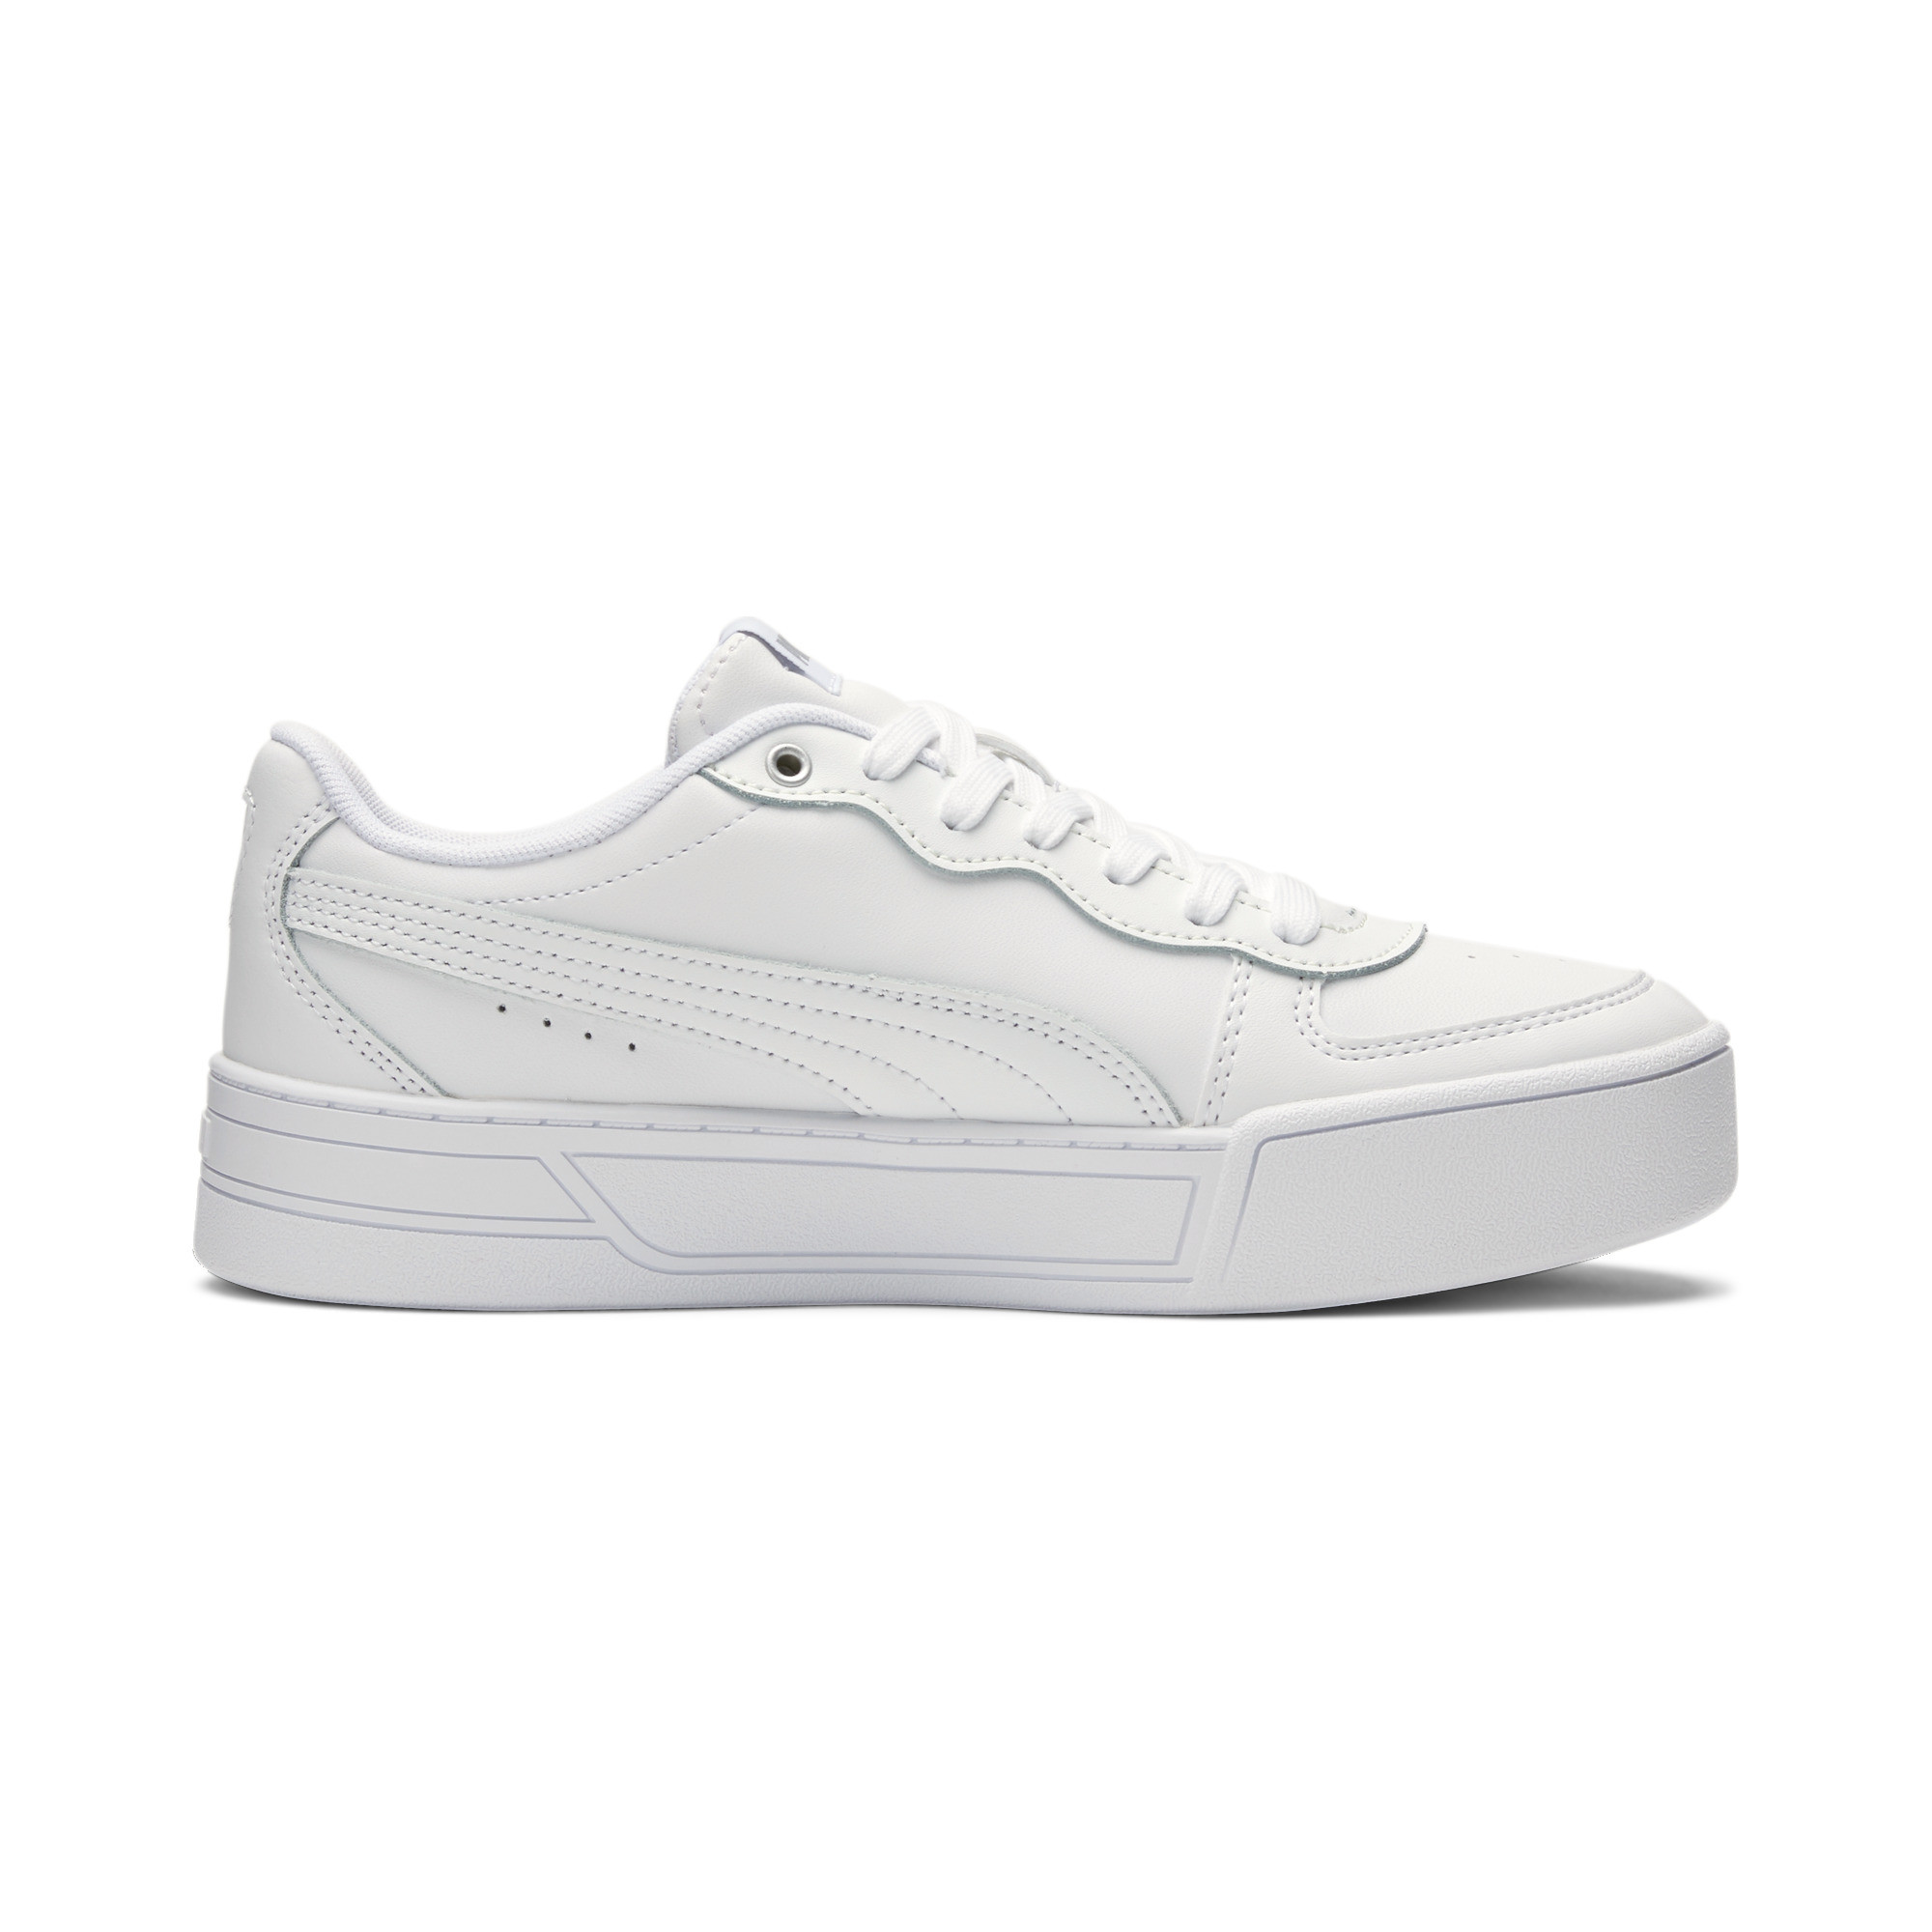 PUMA-Women-039-s-Skye-Sneakers thumbnail 18